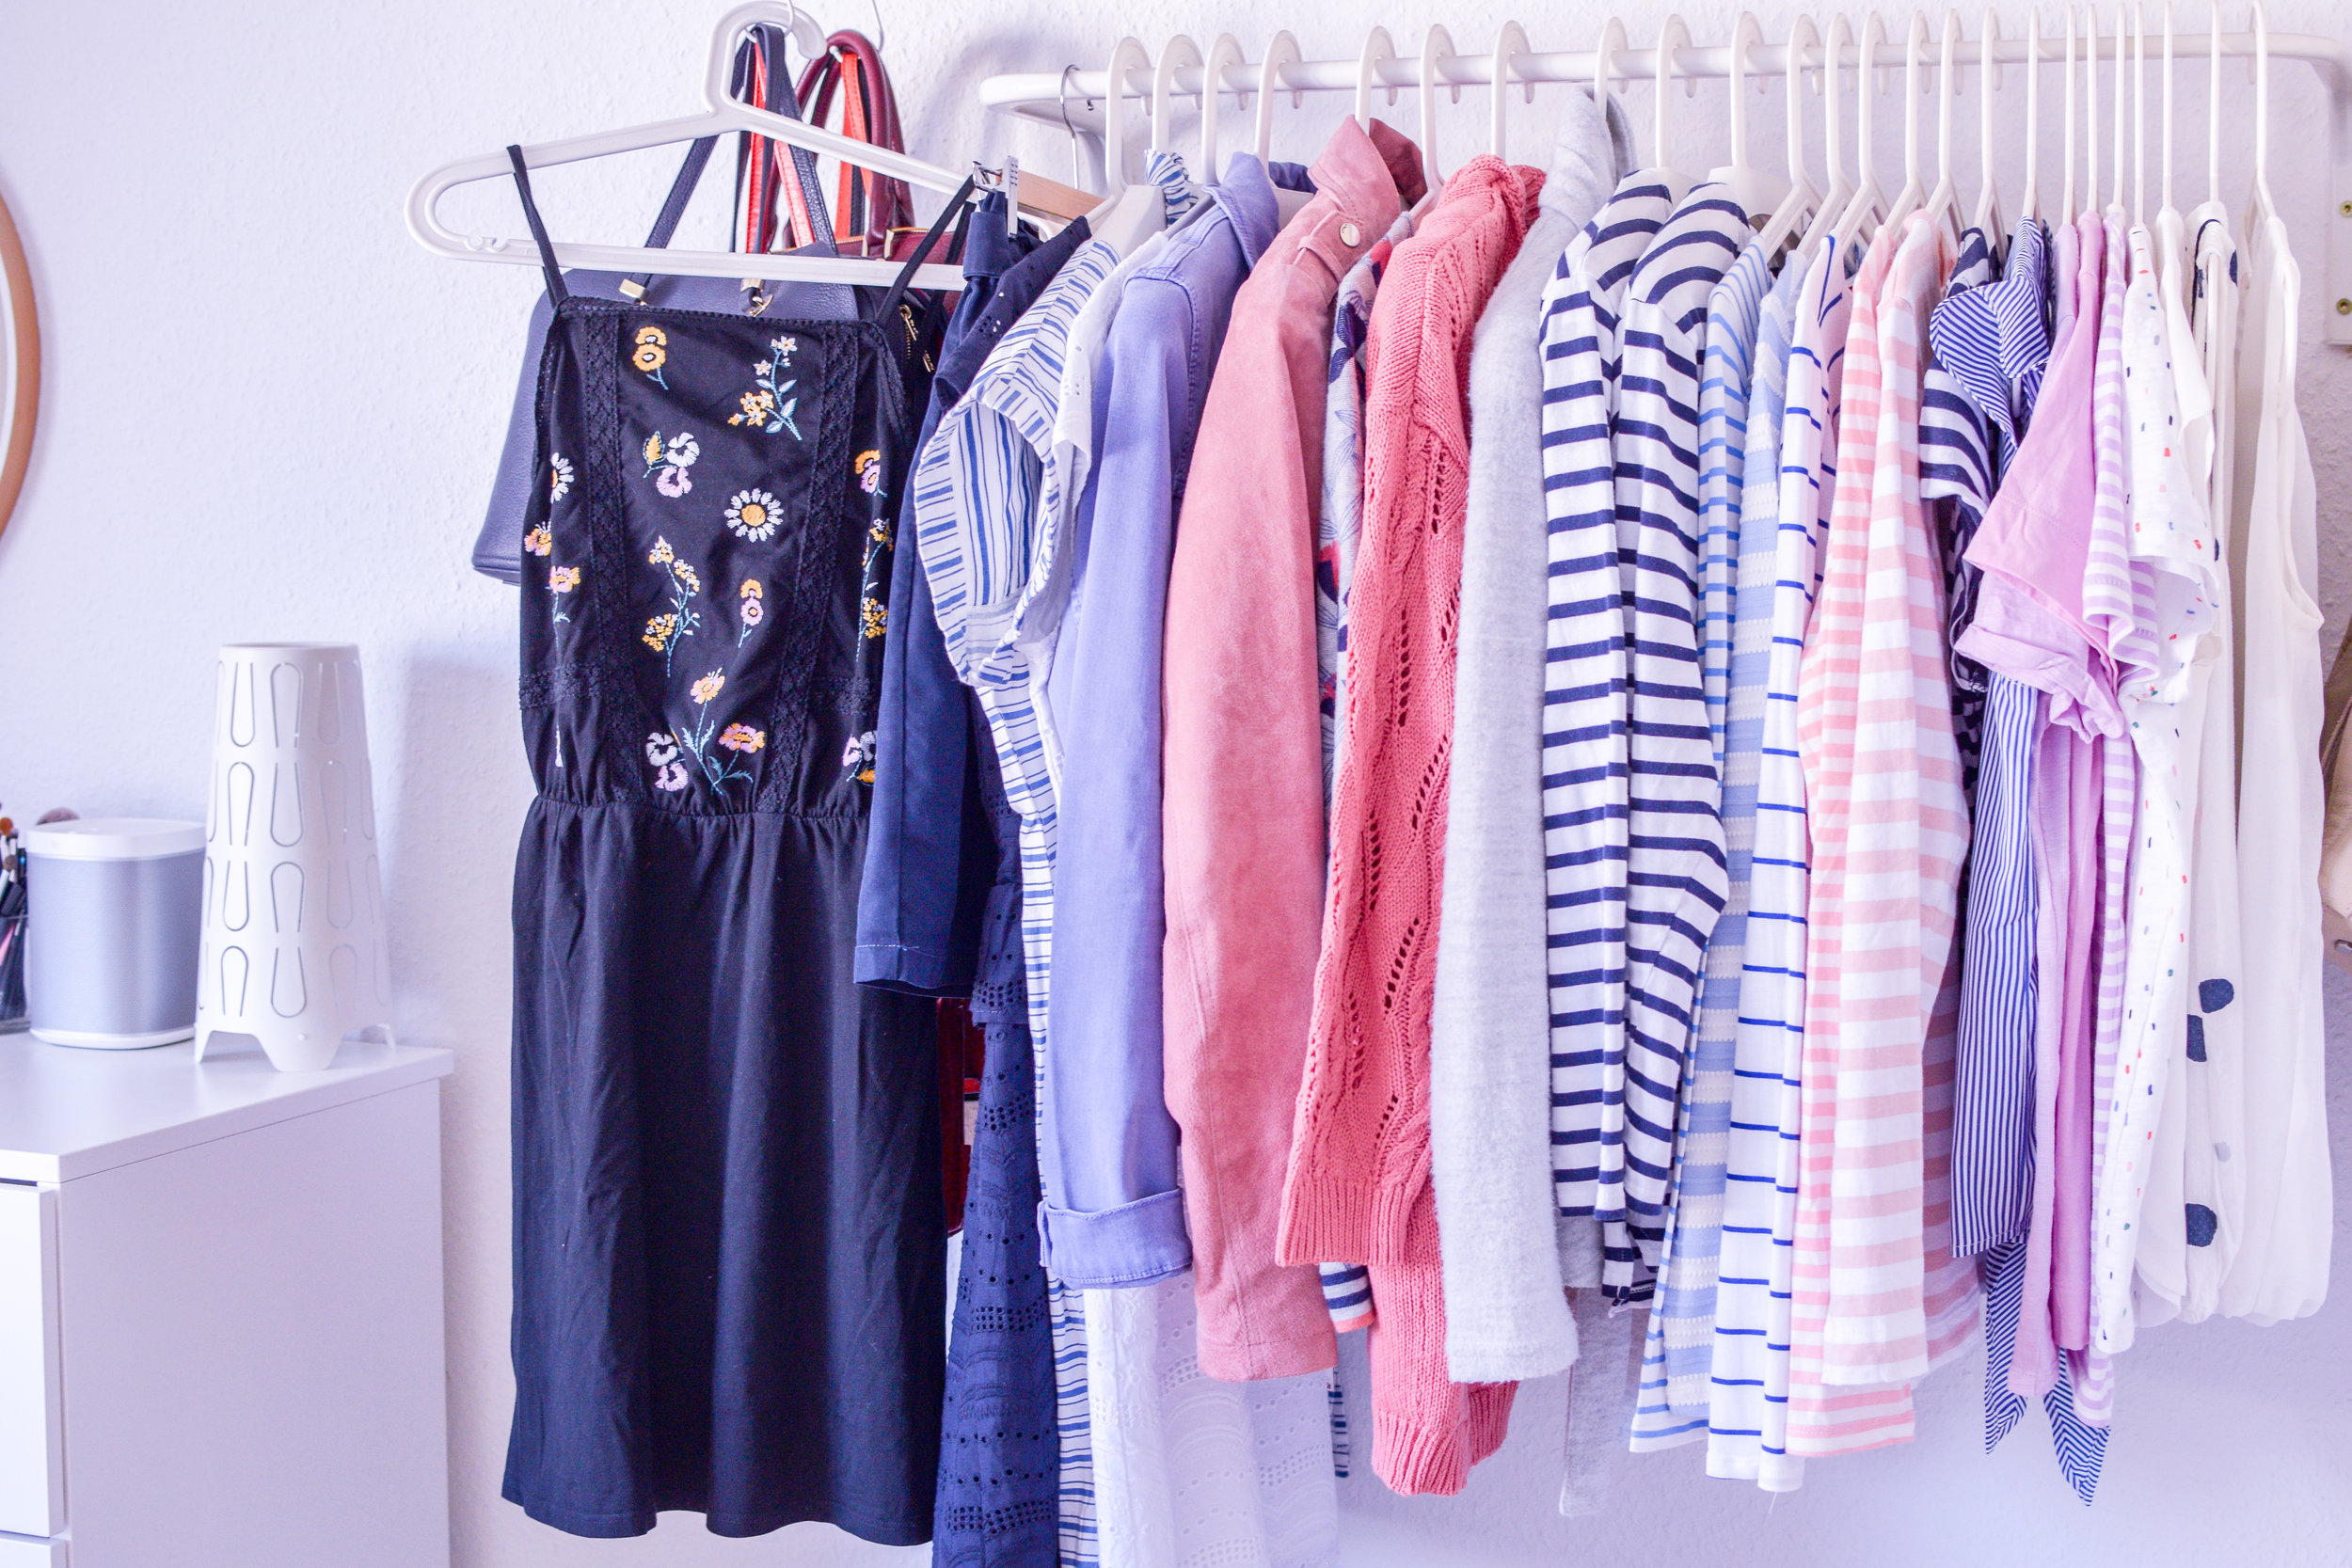 capsule wardrobe dresses and shirts